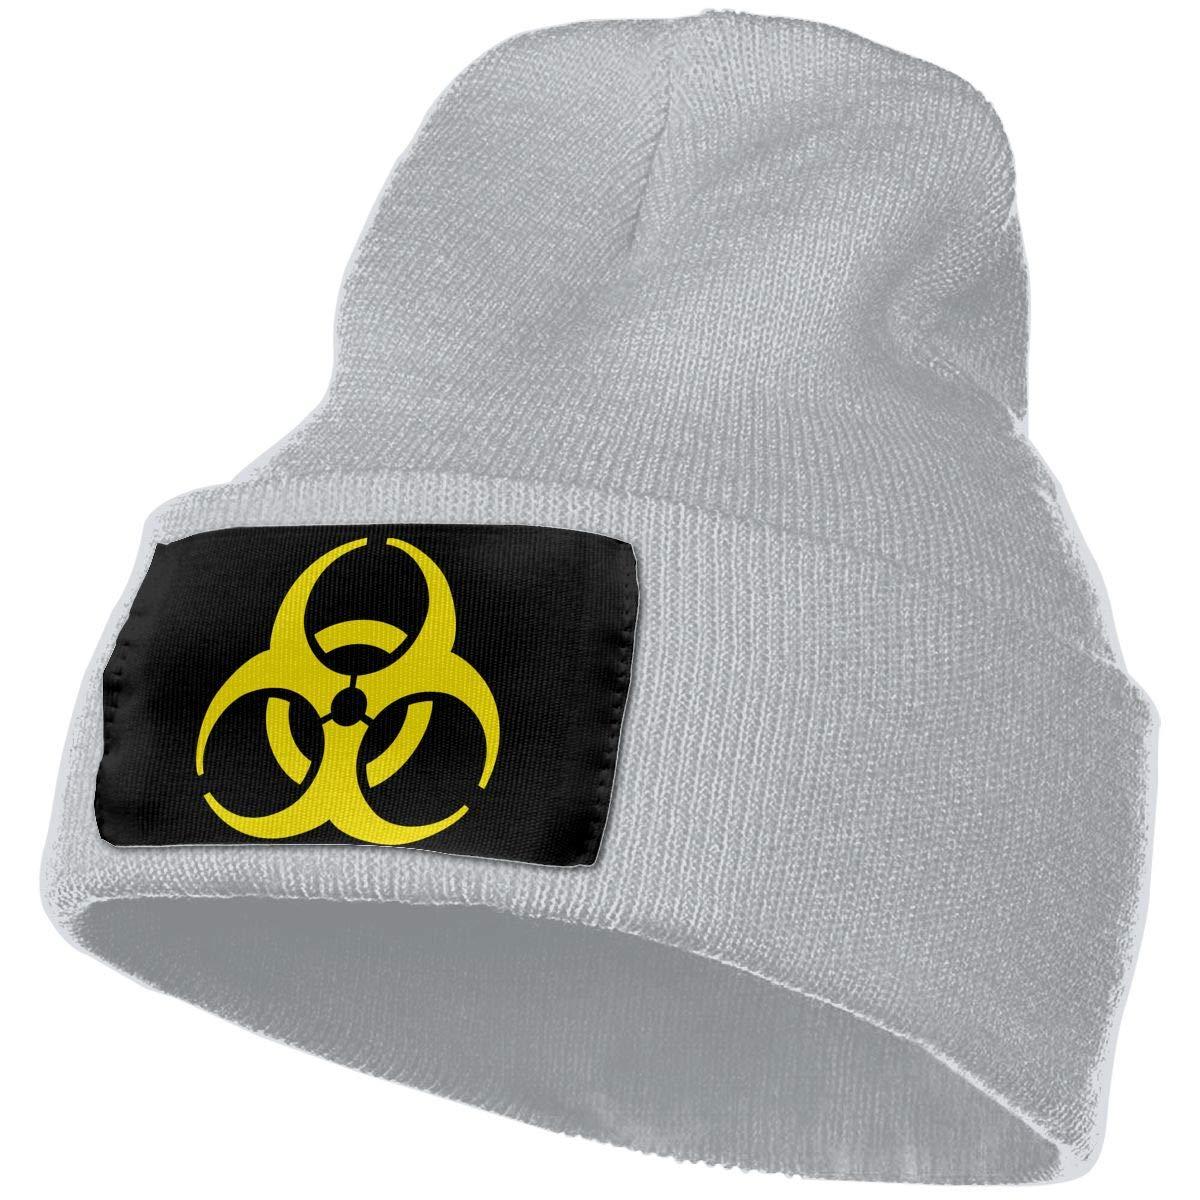 Biohazard Warning Symbol Men/&Women Warm Winter Knit Plain Beanie Hat Skull Cap Acrylic Knit Cuff Hat